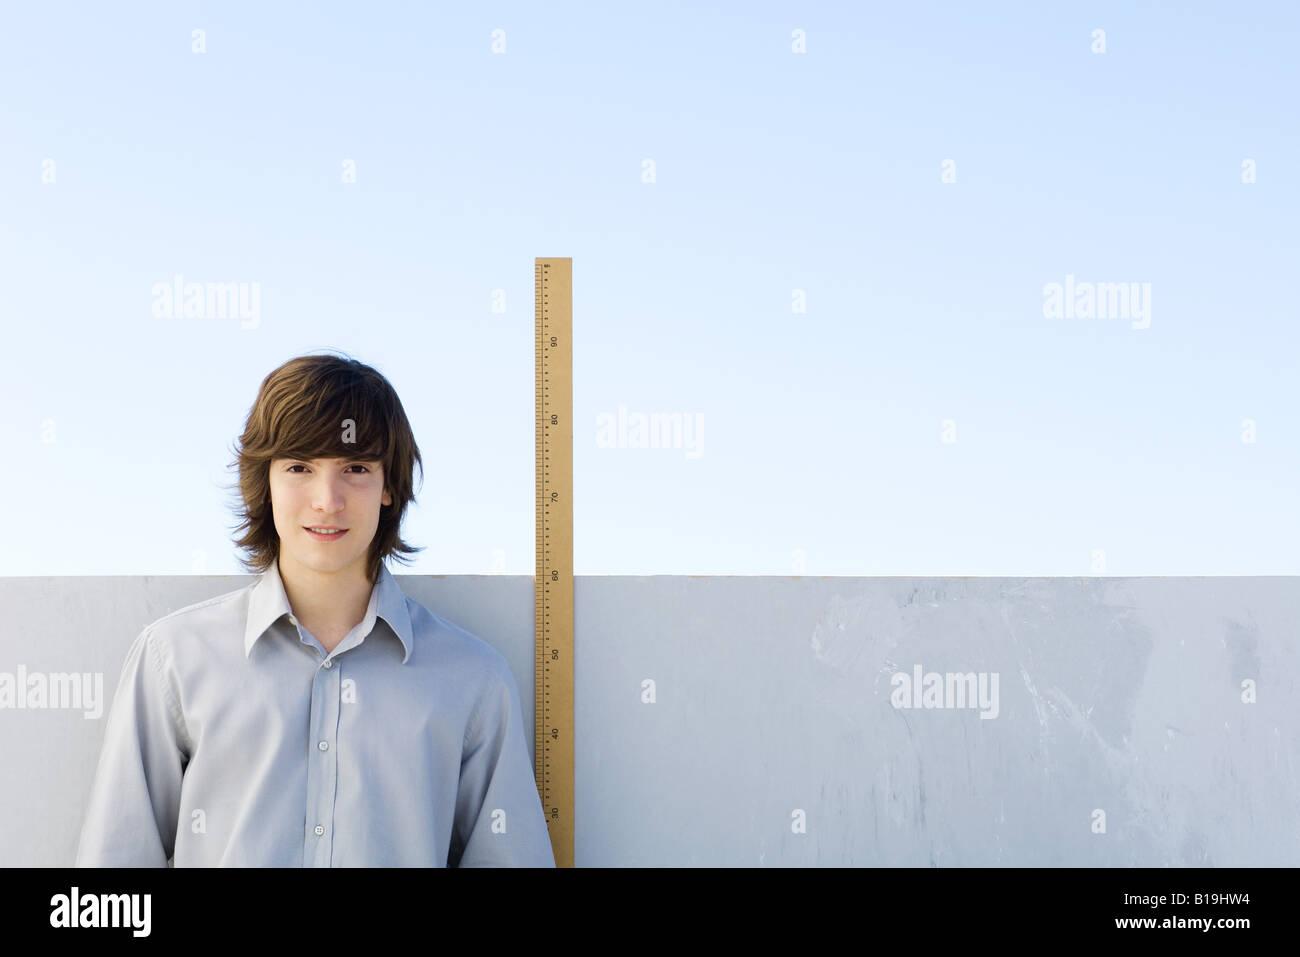 Young man standing beside yardstick, smiling at camera - Stock Image